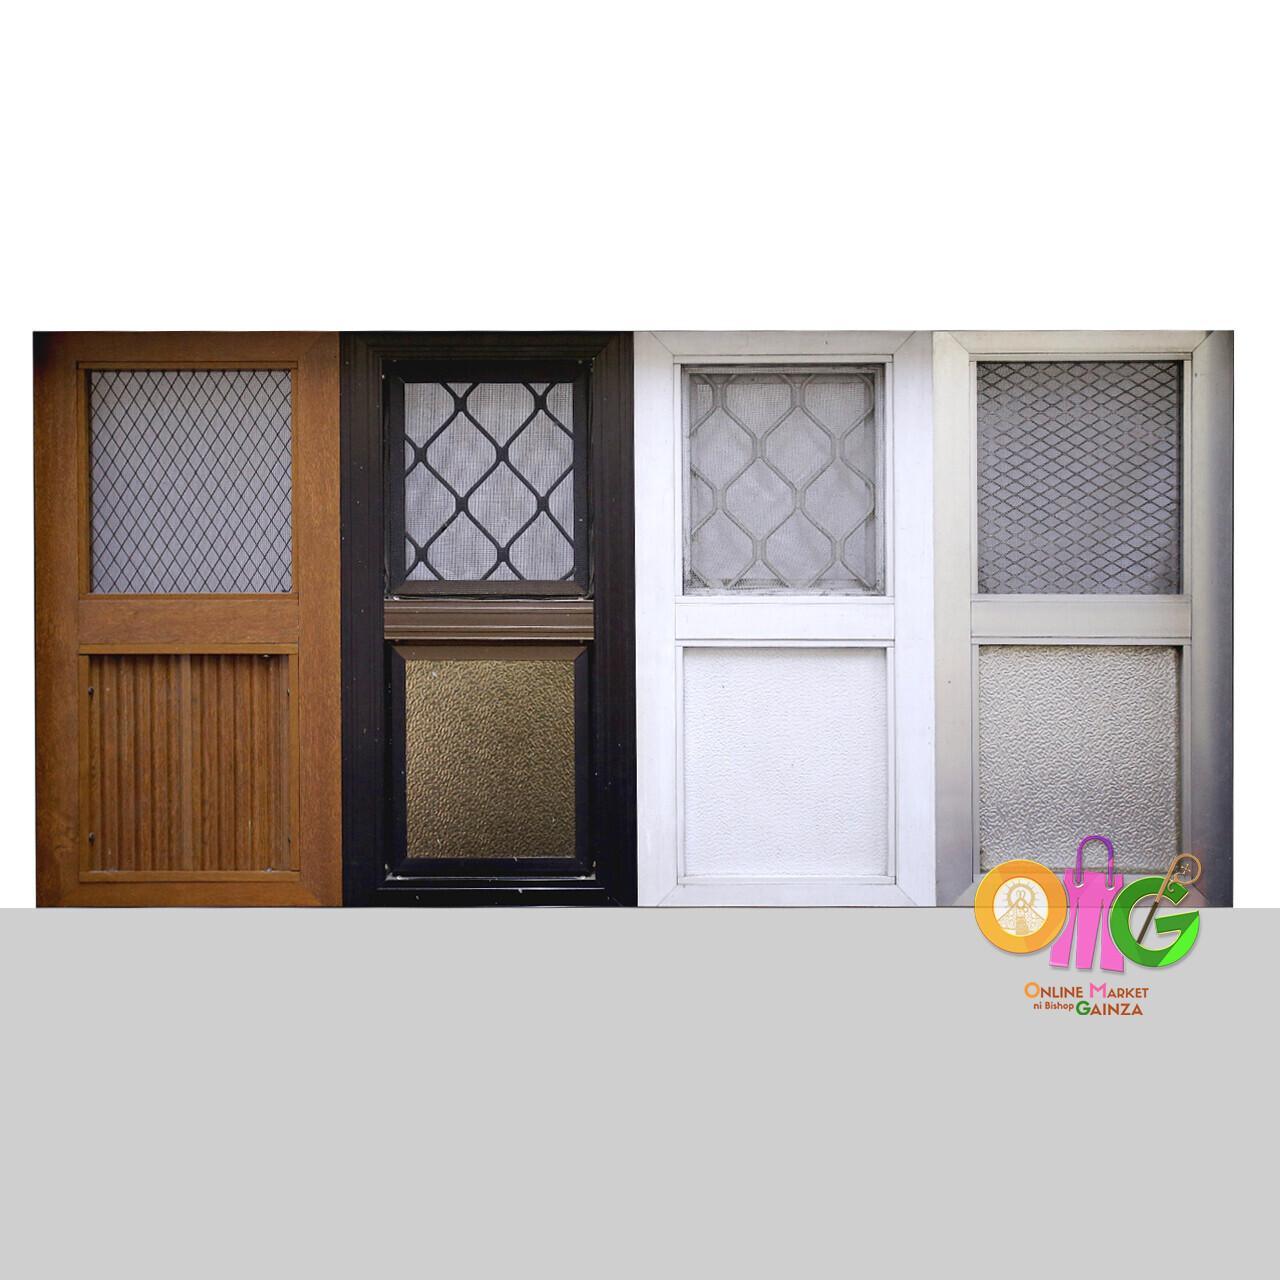 ELPA Glass and Aluminum - Screen Doors (4 varieties)